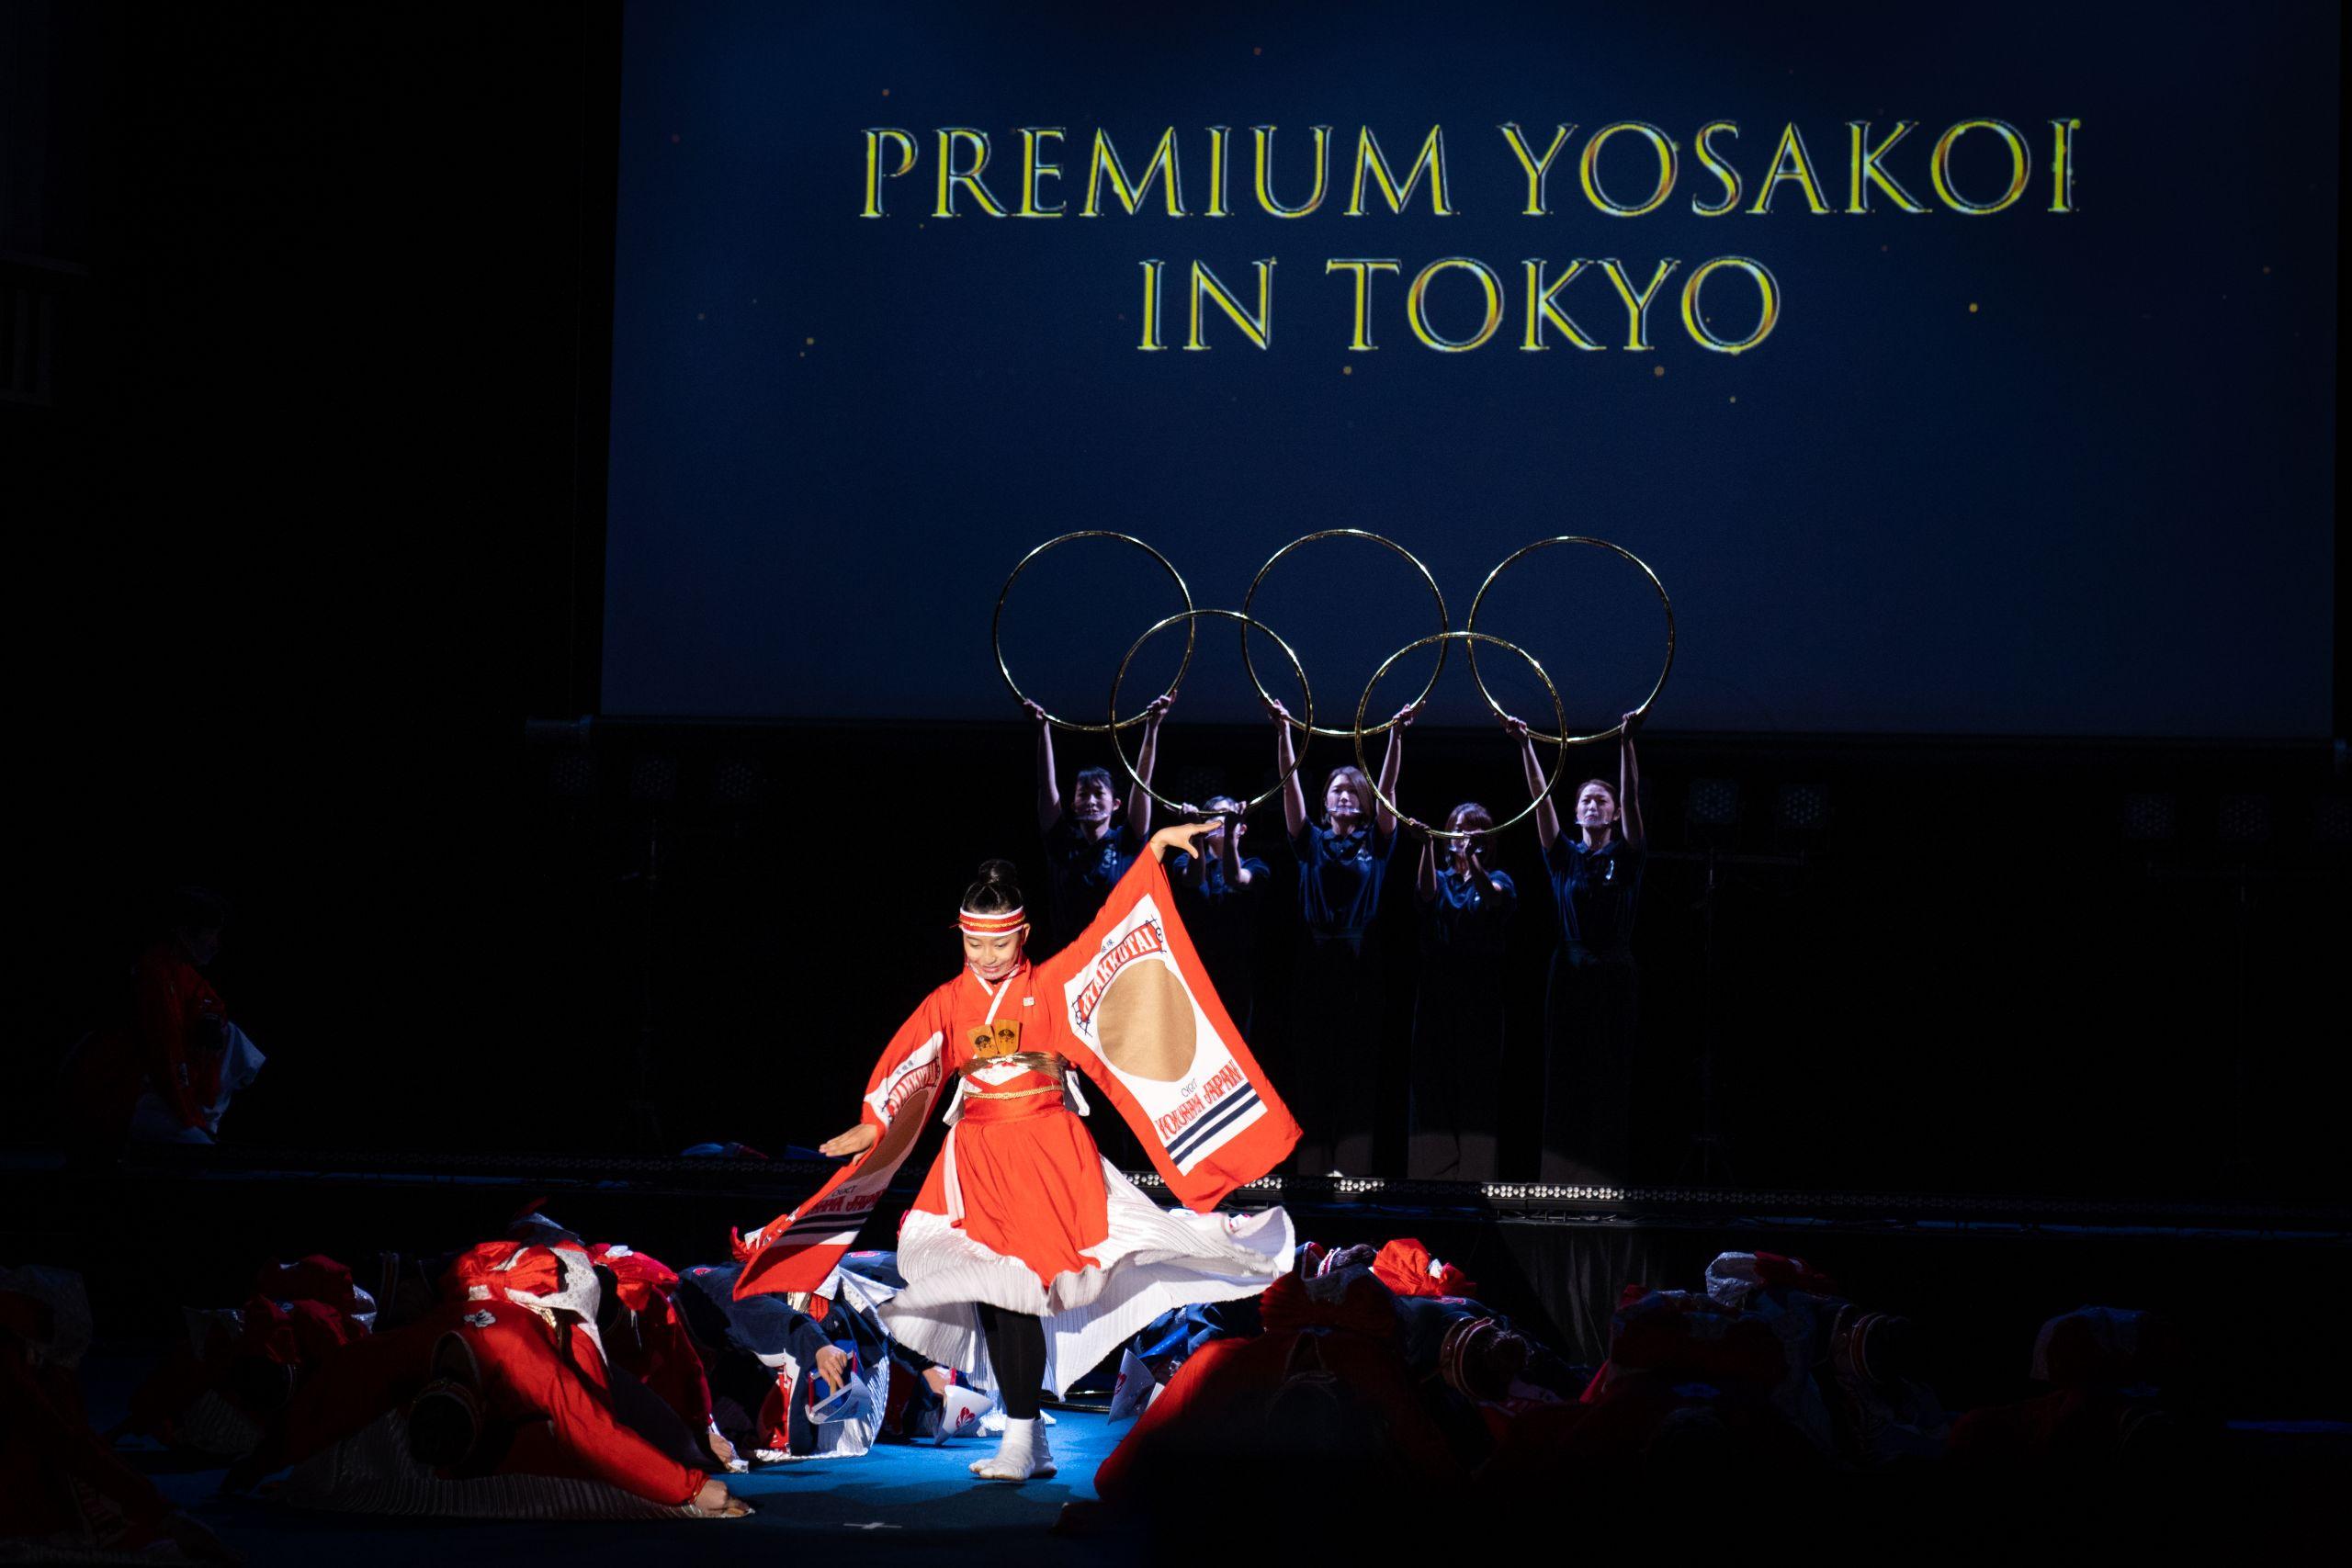 Premium Yosakoi